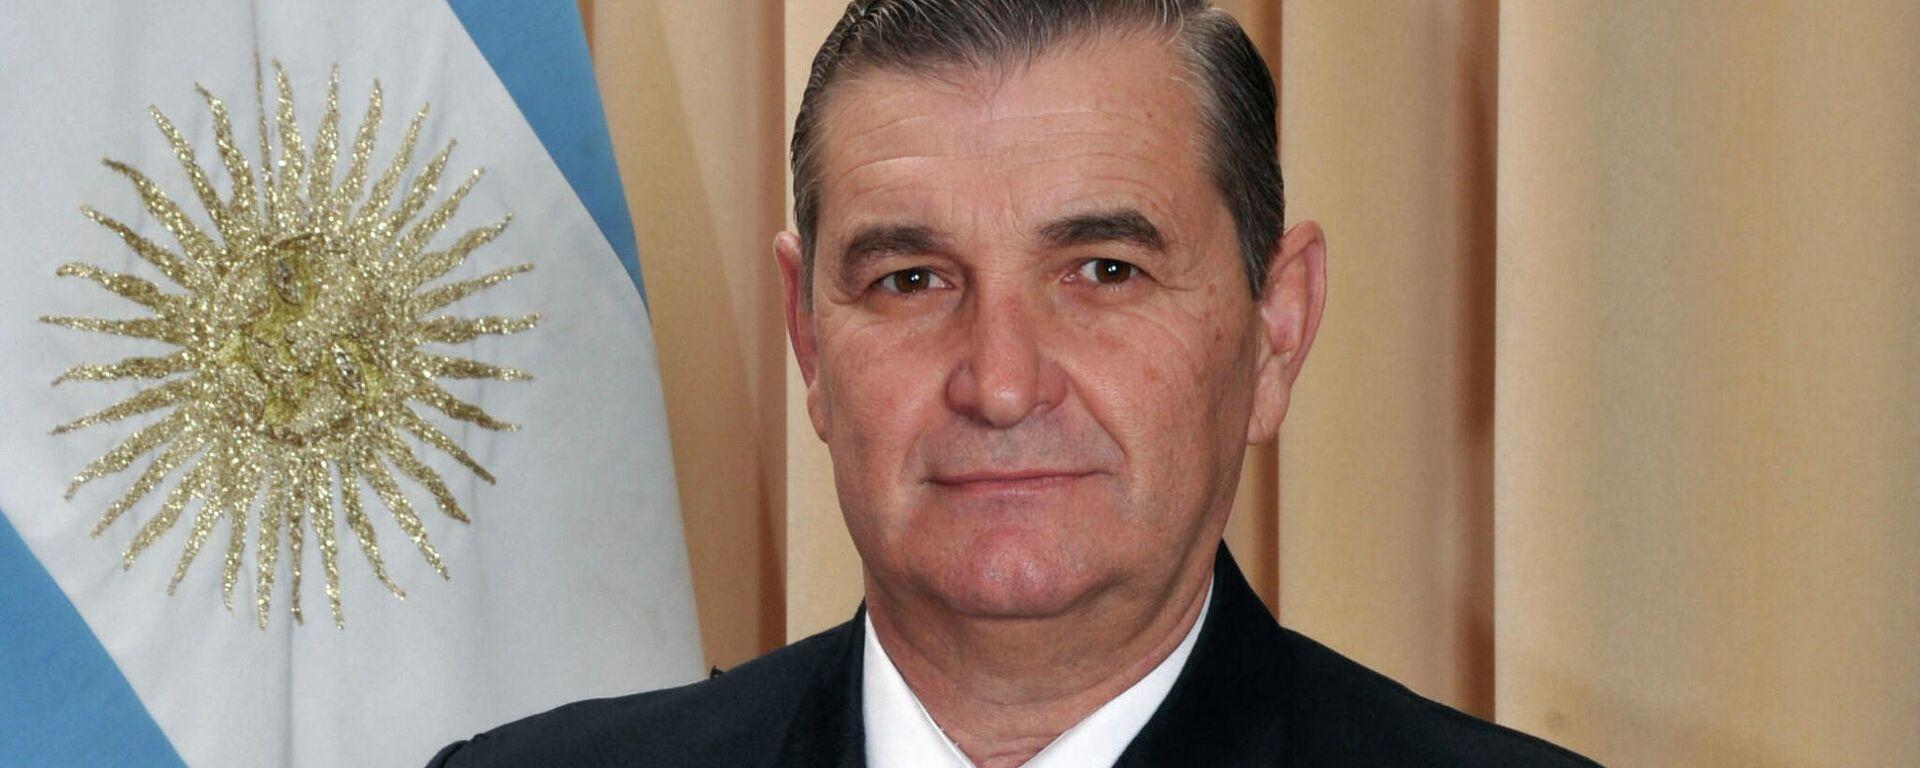 Marcelo Srur, exjefe de la Armada argentina - Sputnik Mundo, 1920, 22.03.2021